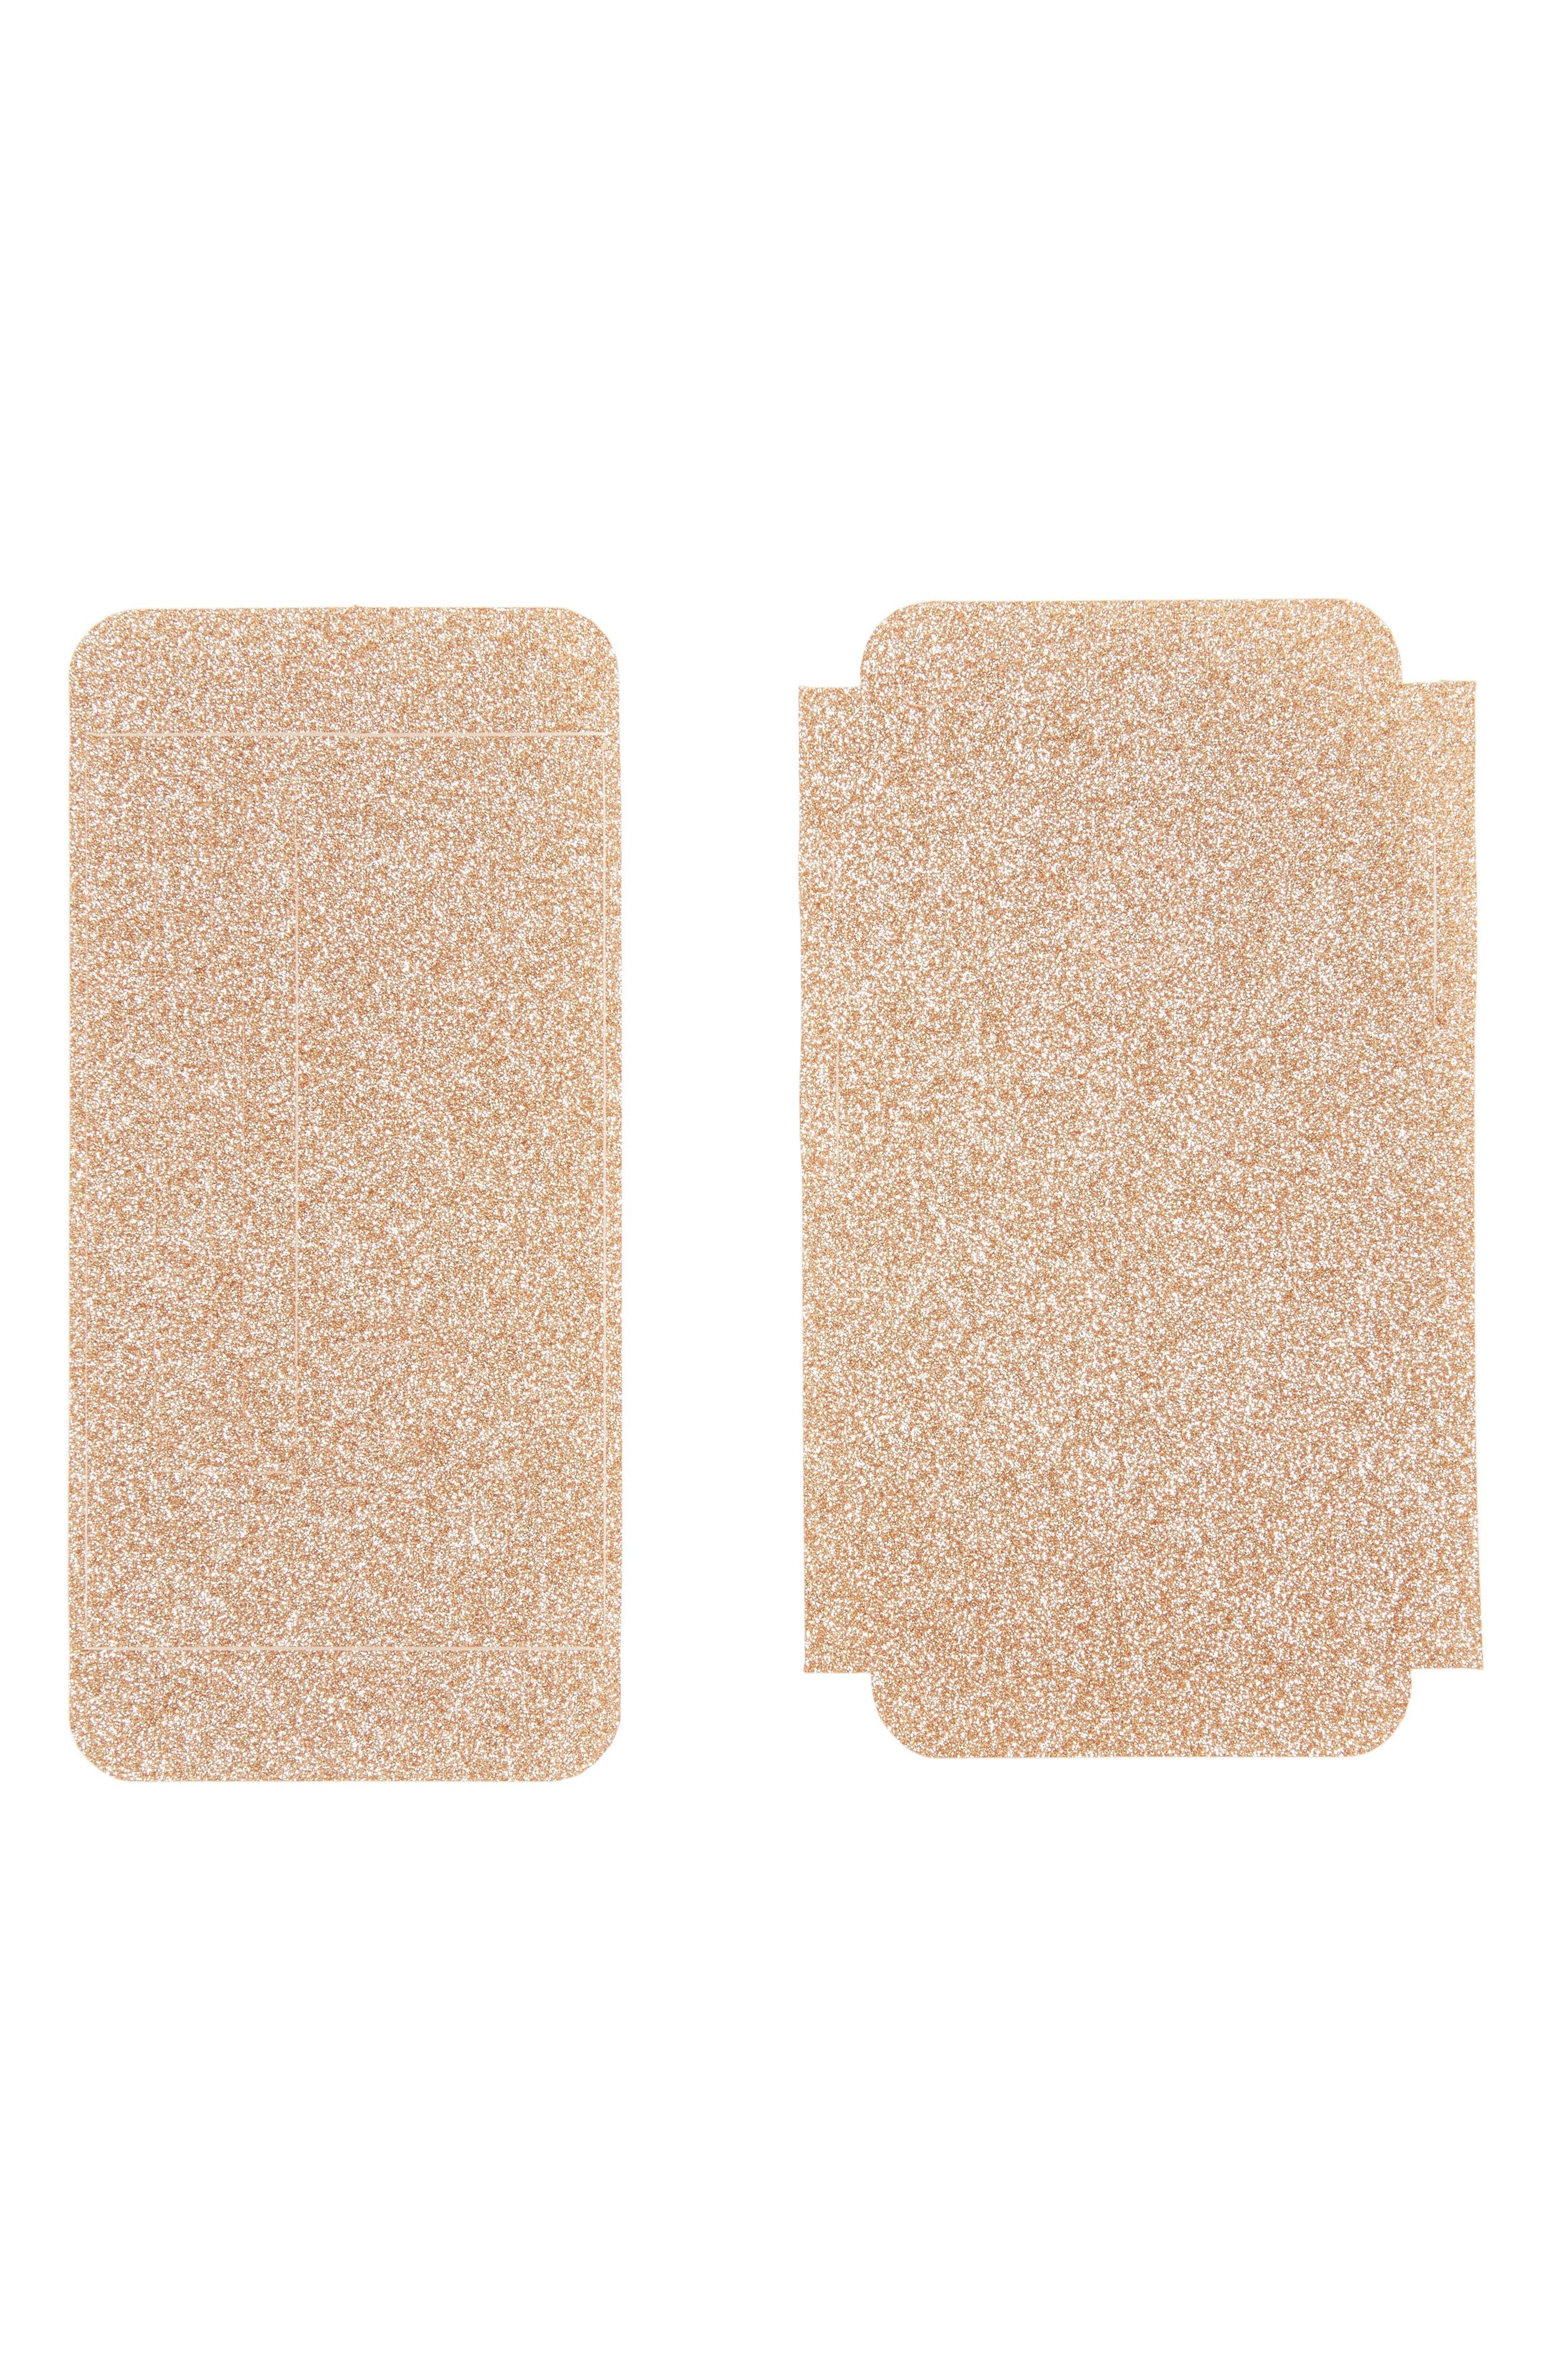 Main Image - Velvet Caviar Gold Glitter iPhone 7 Decal